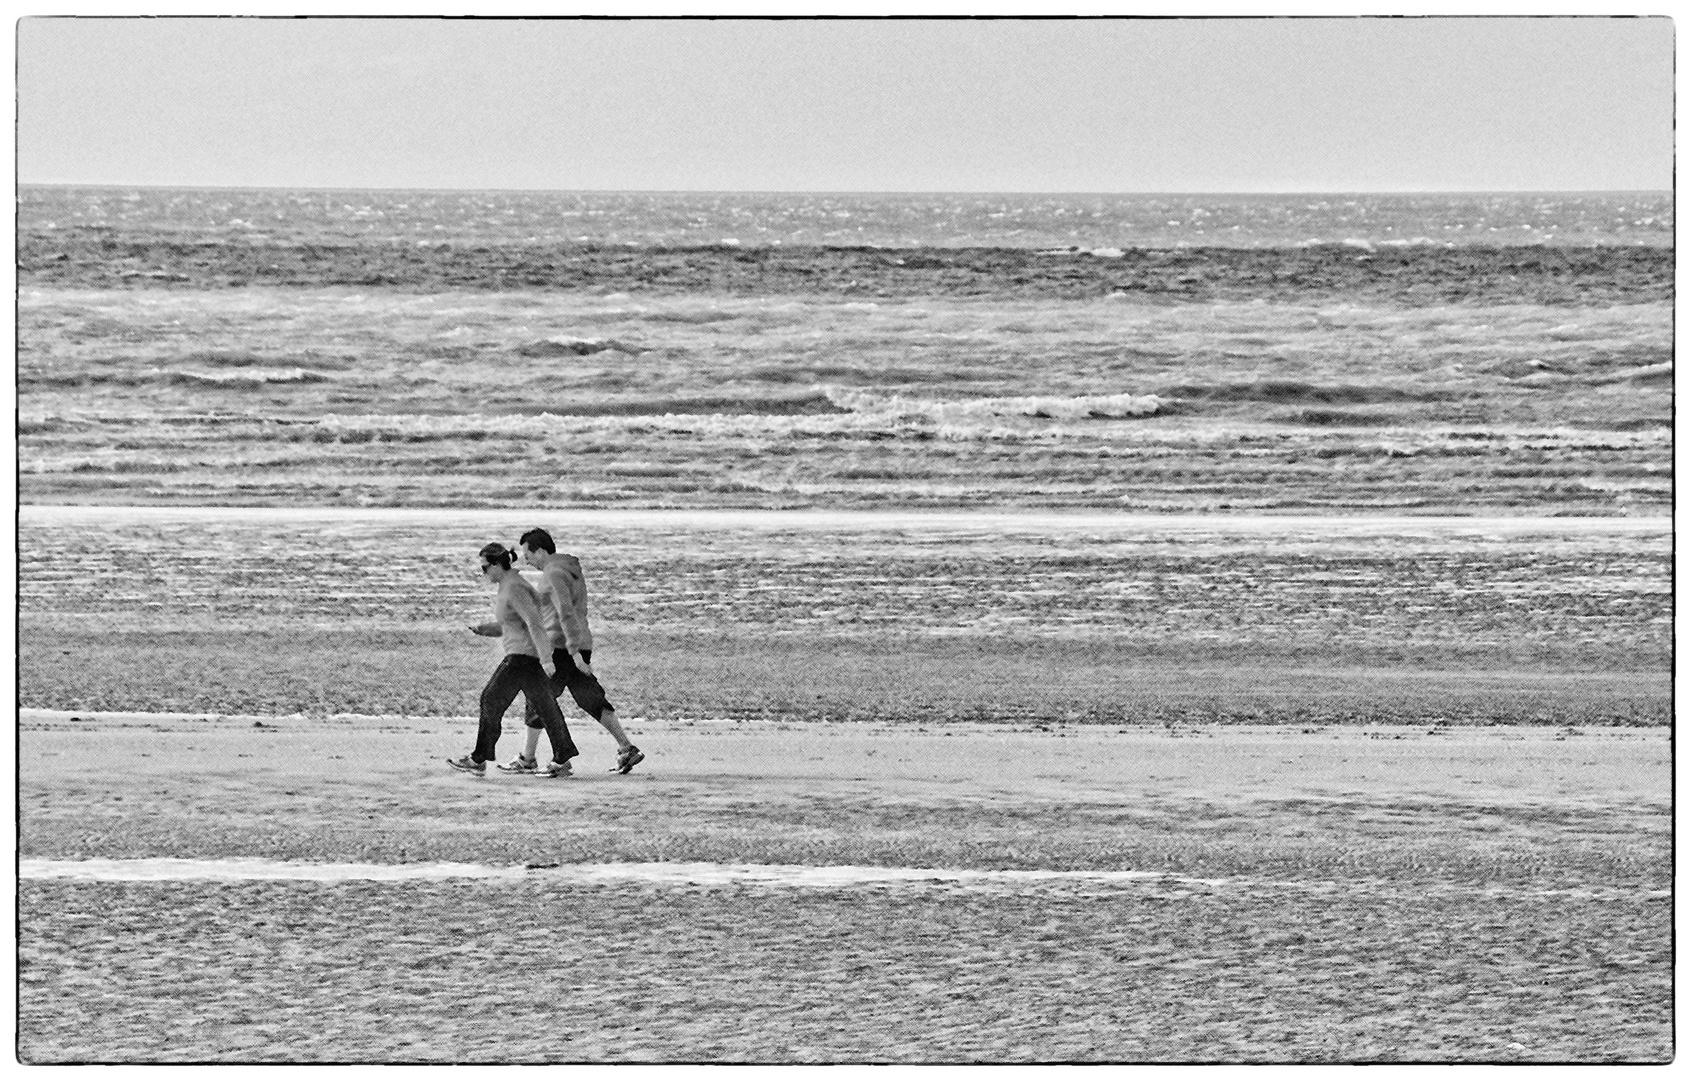 Strandläufer - Coureurs de plage